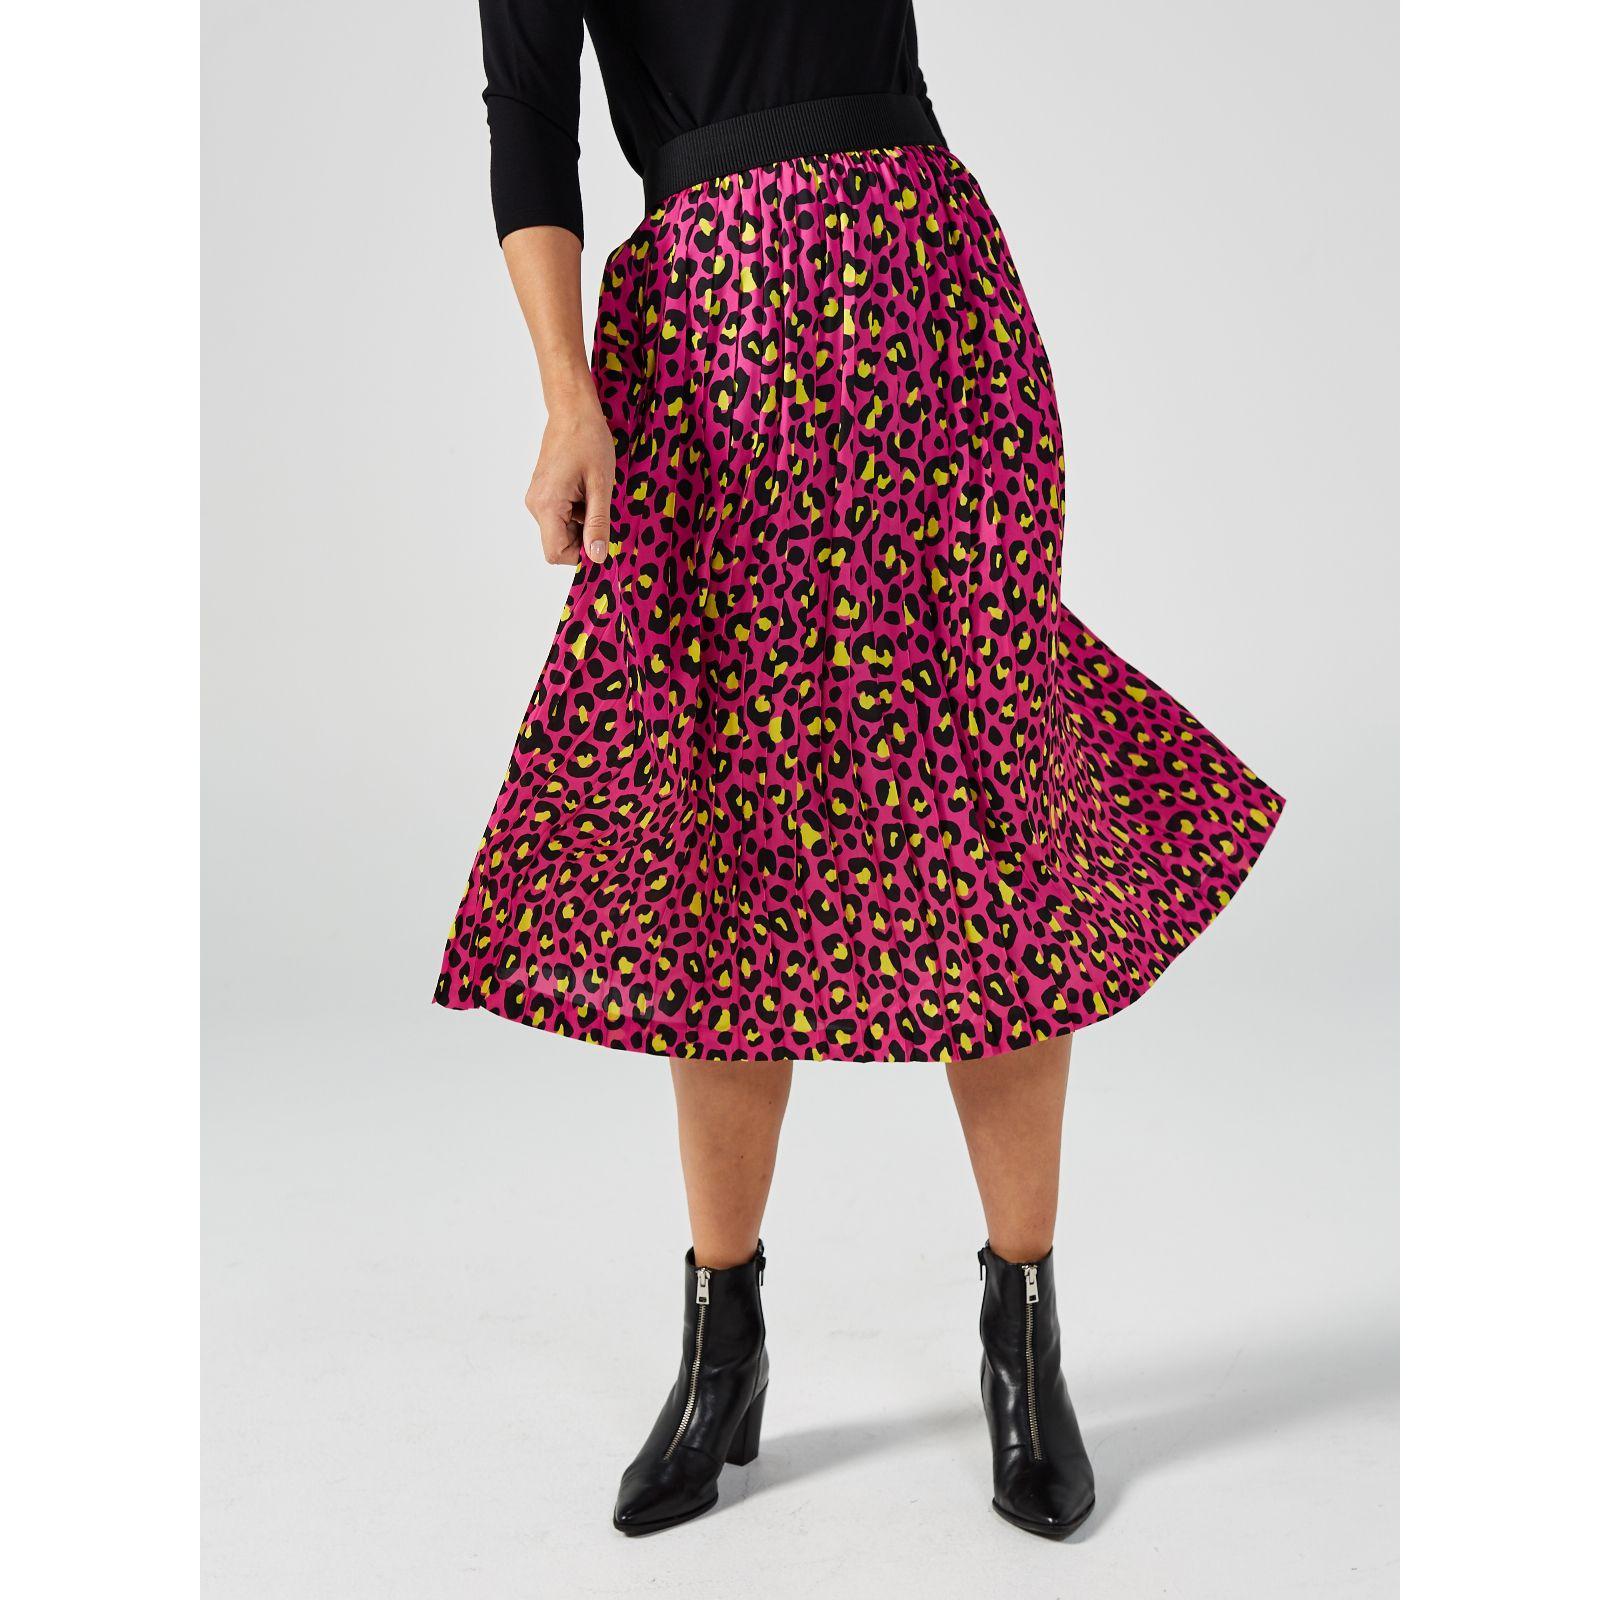 Helene Berman Animal Print Pleated Skirt - QVC UK